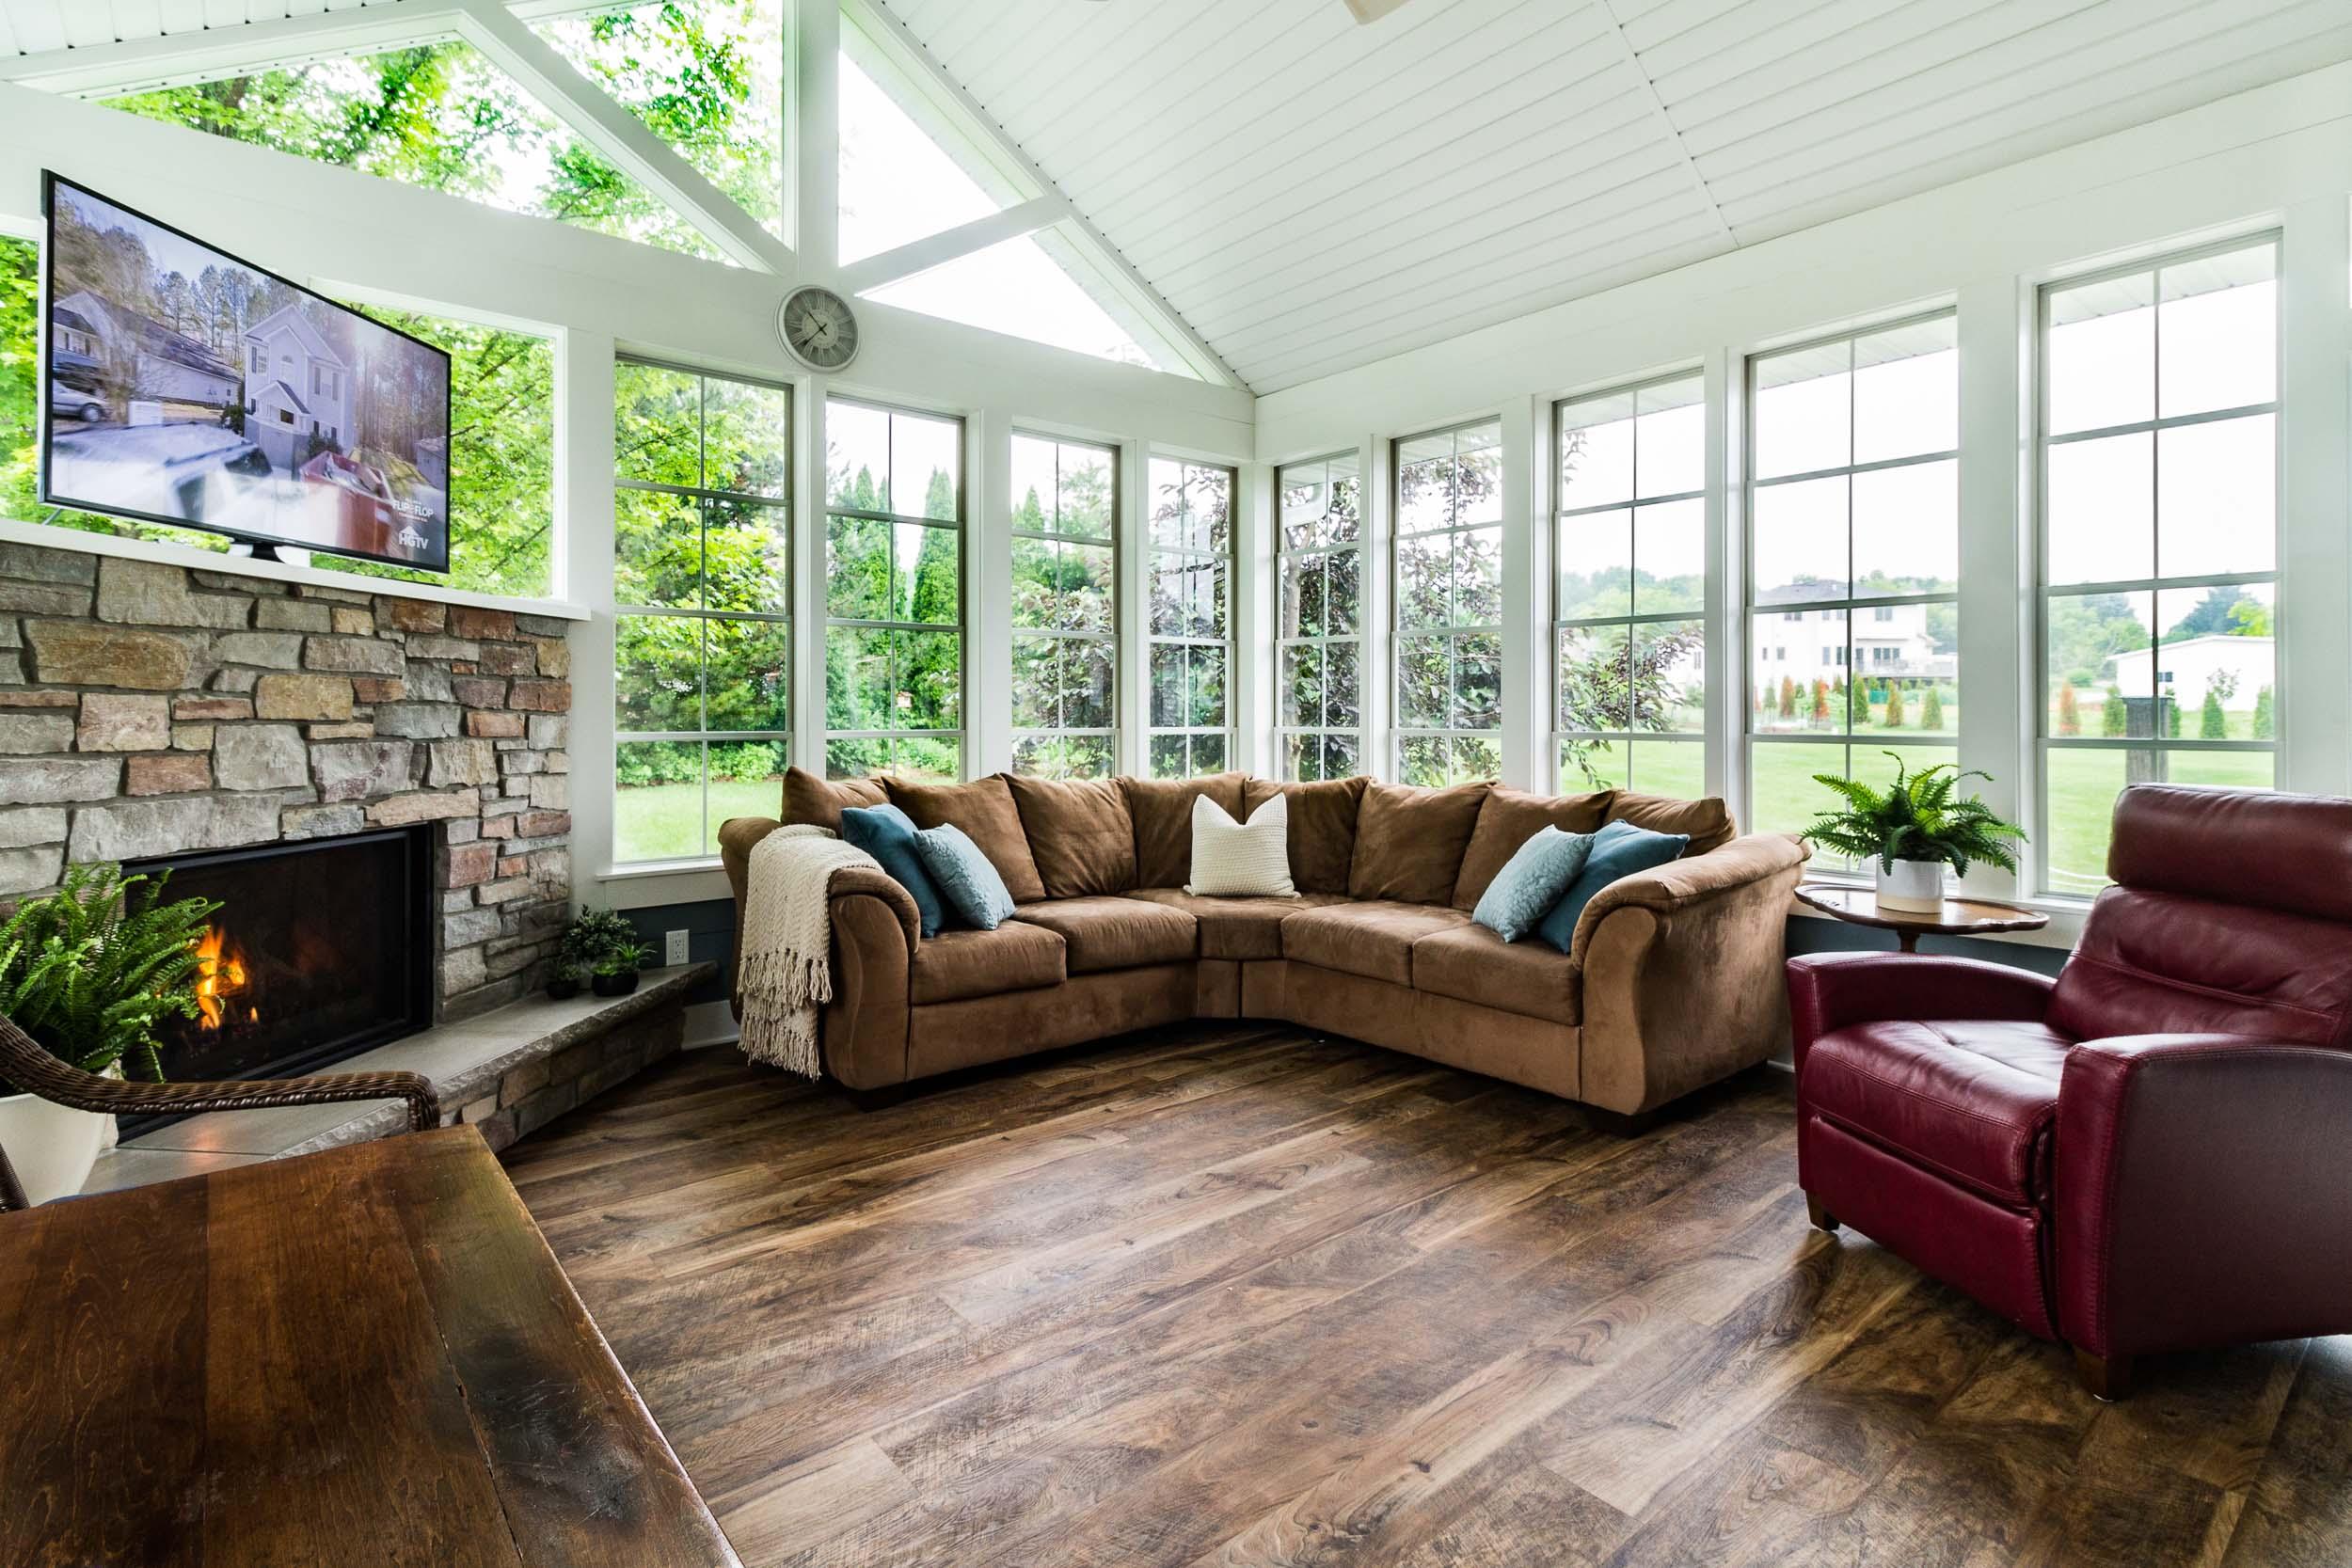 This Three Season Porch Has Styleline Riviera 4-Panel Windows